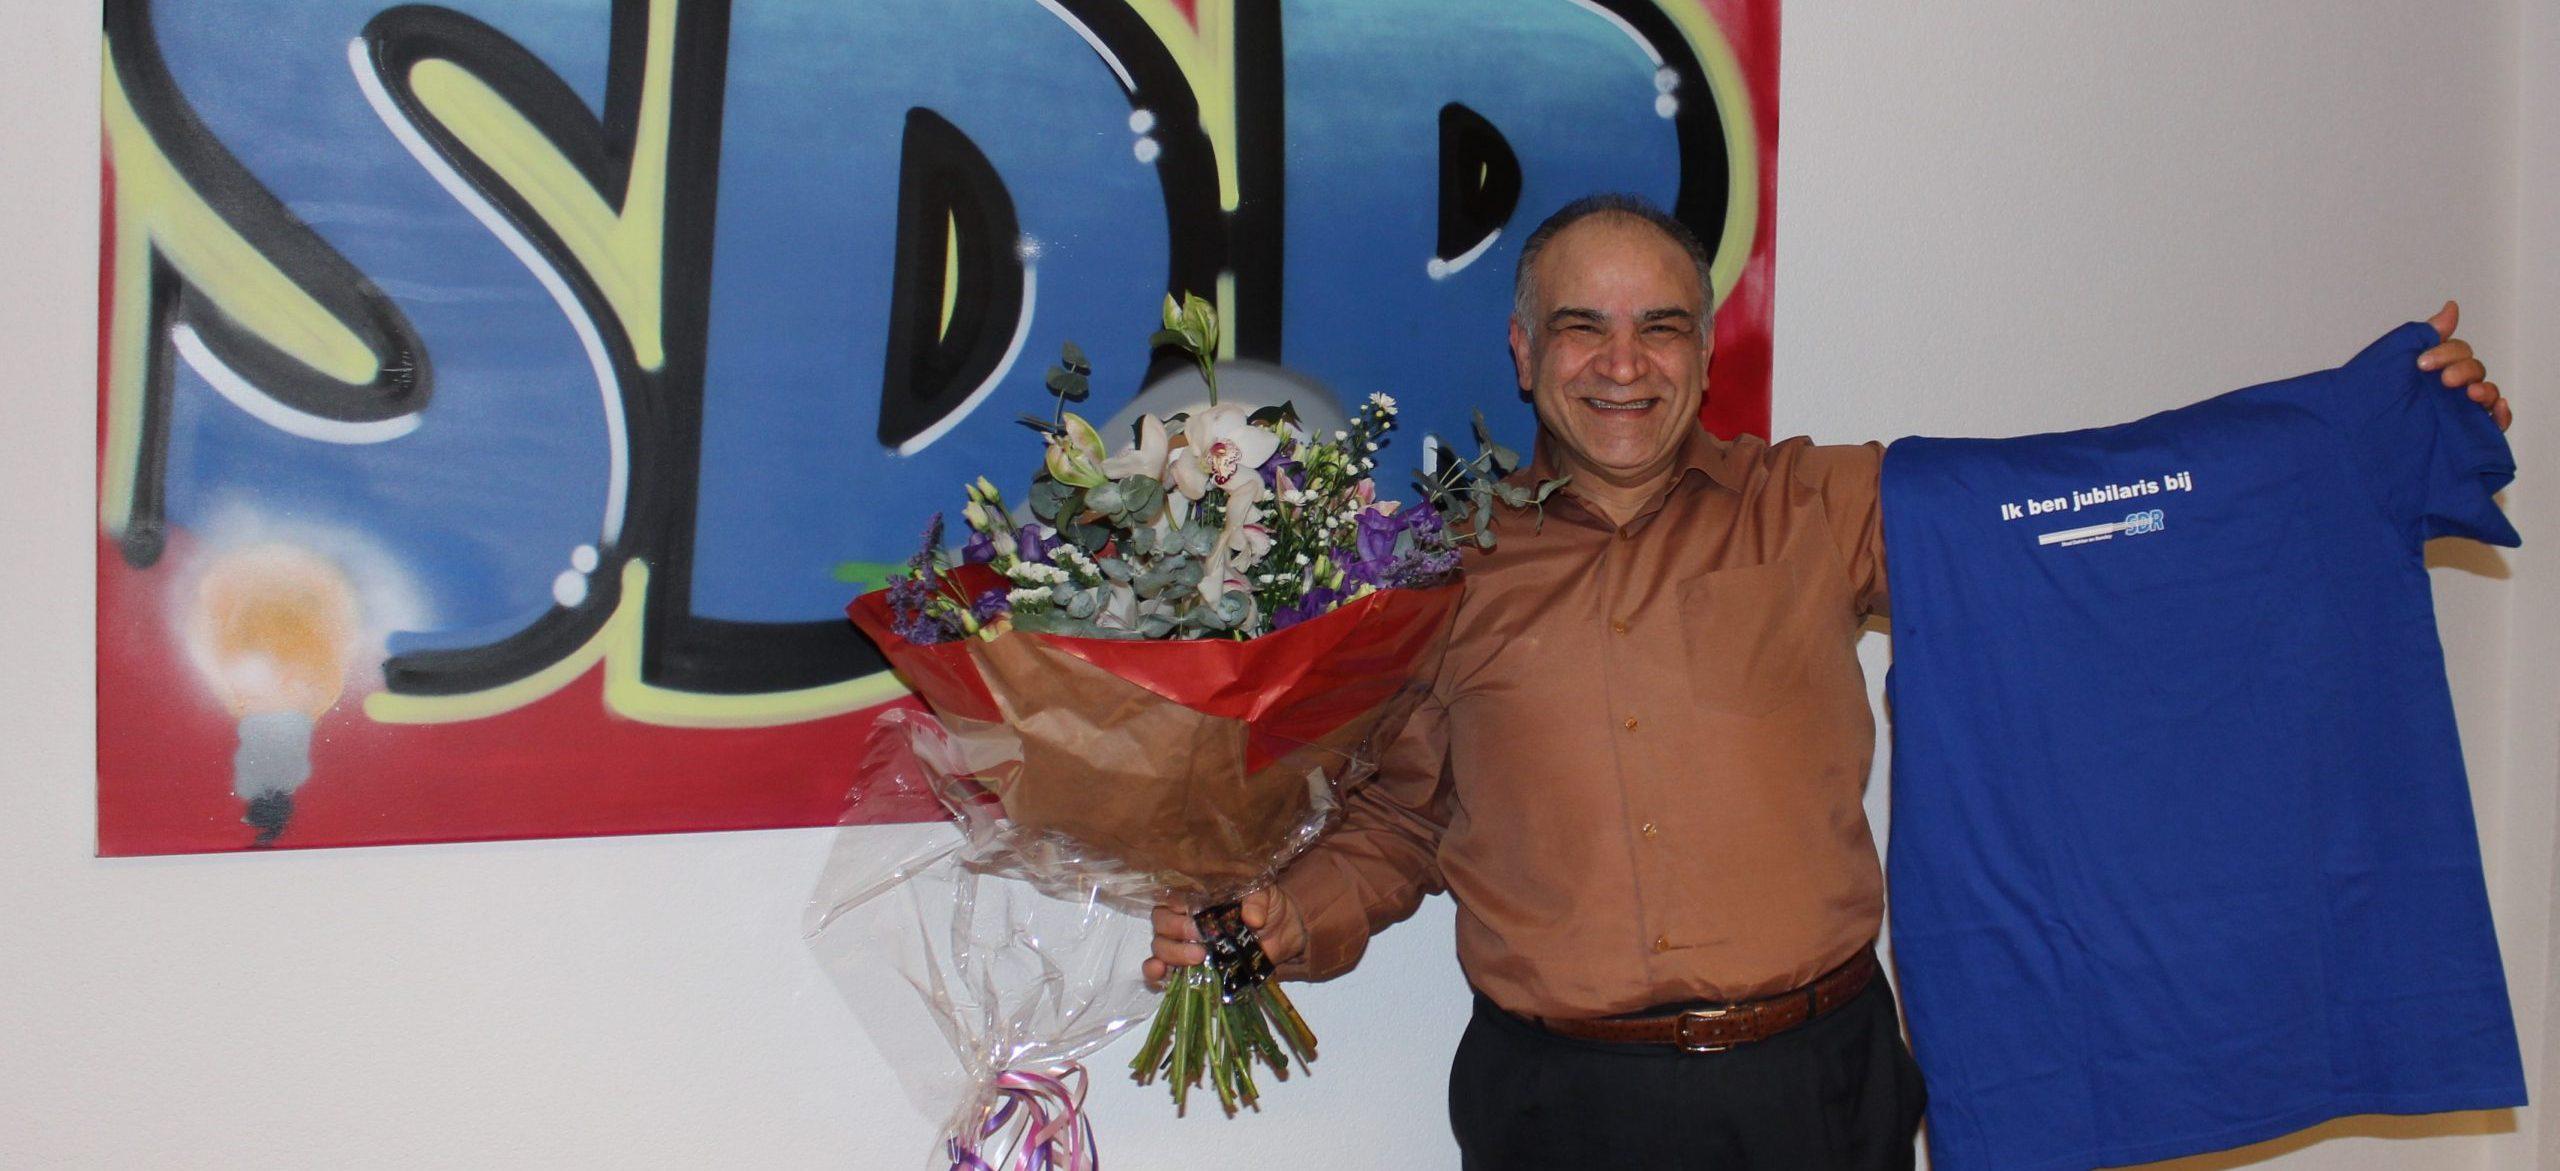 Hussein Fahimi 25 jaar in dienst bij SDR